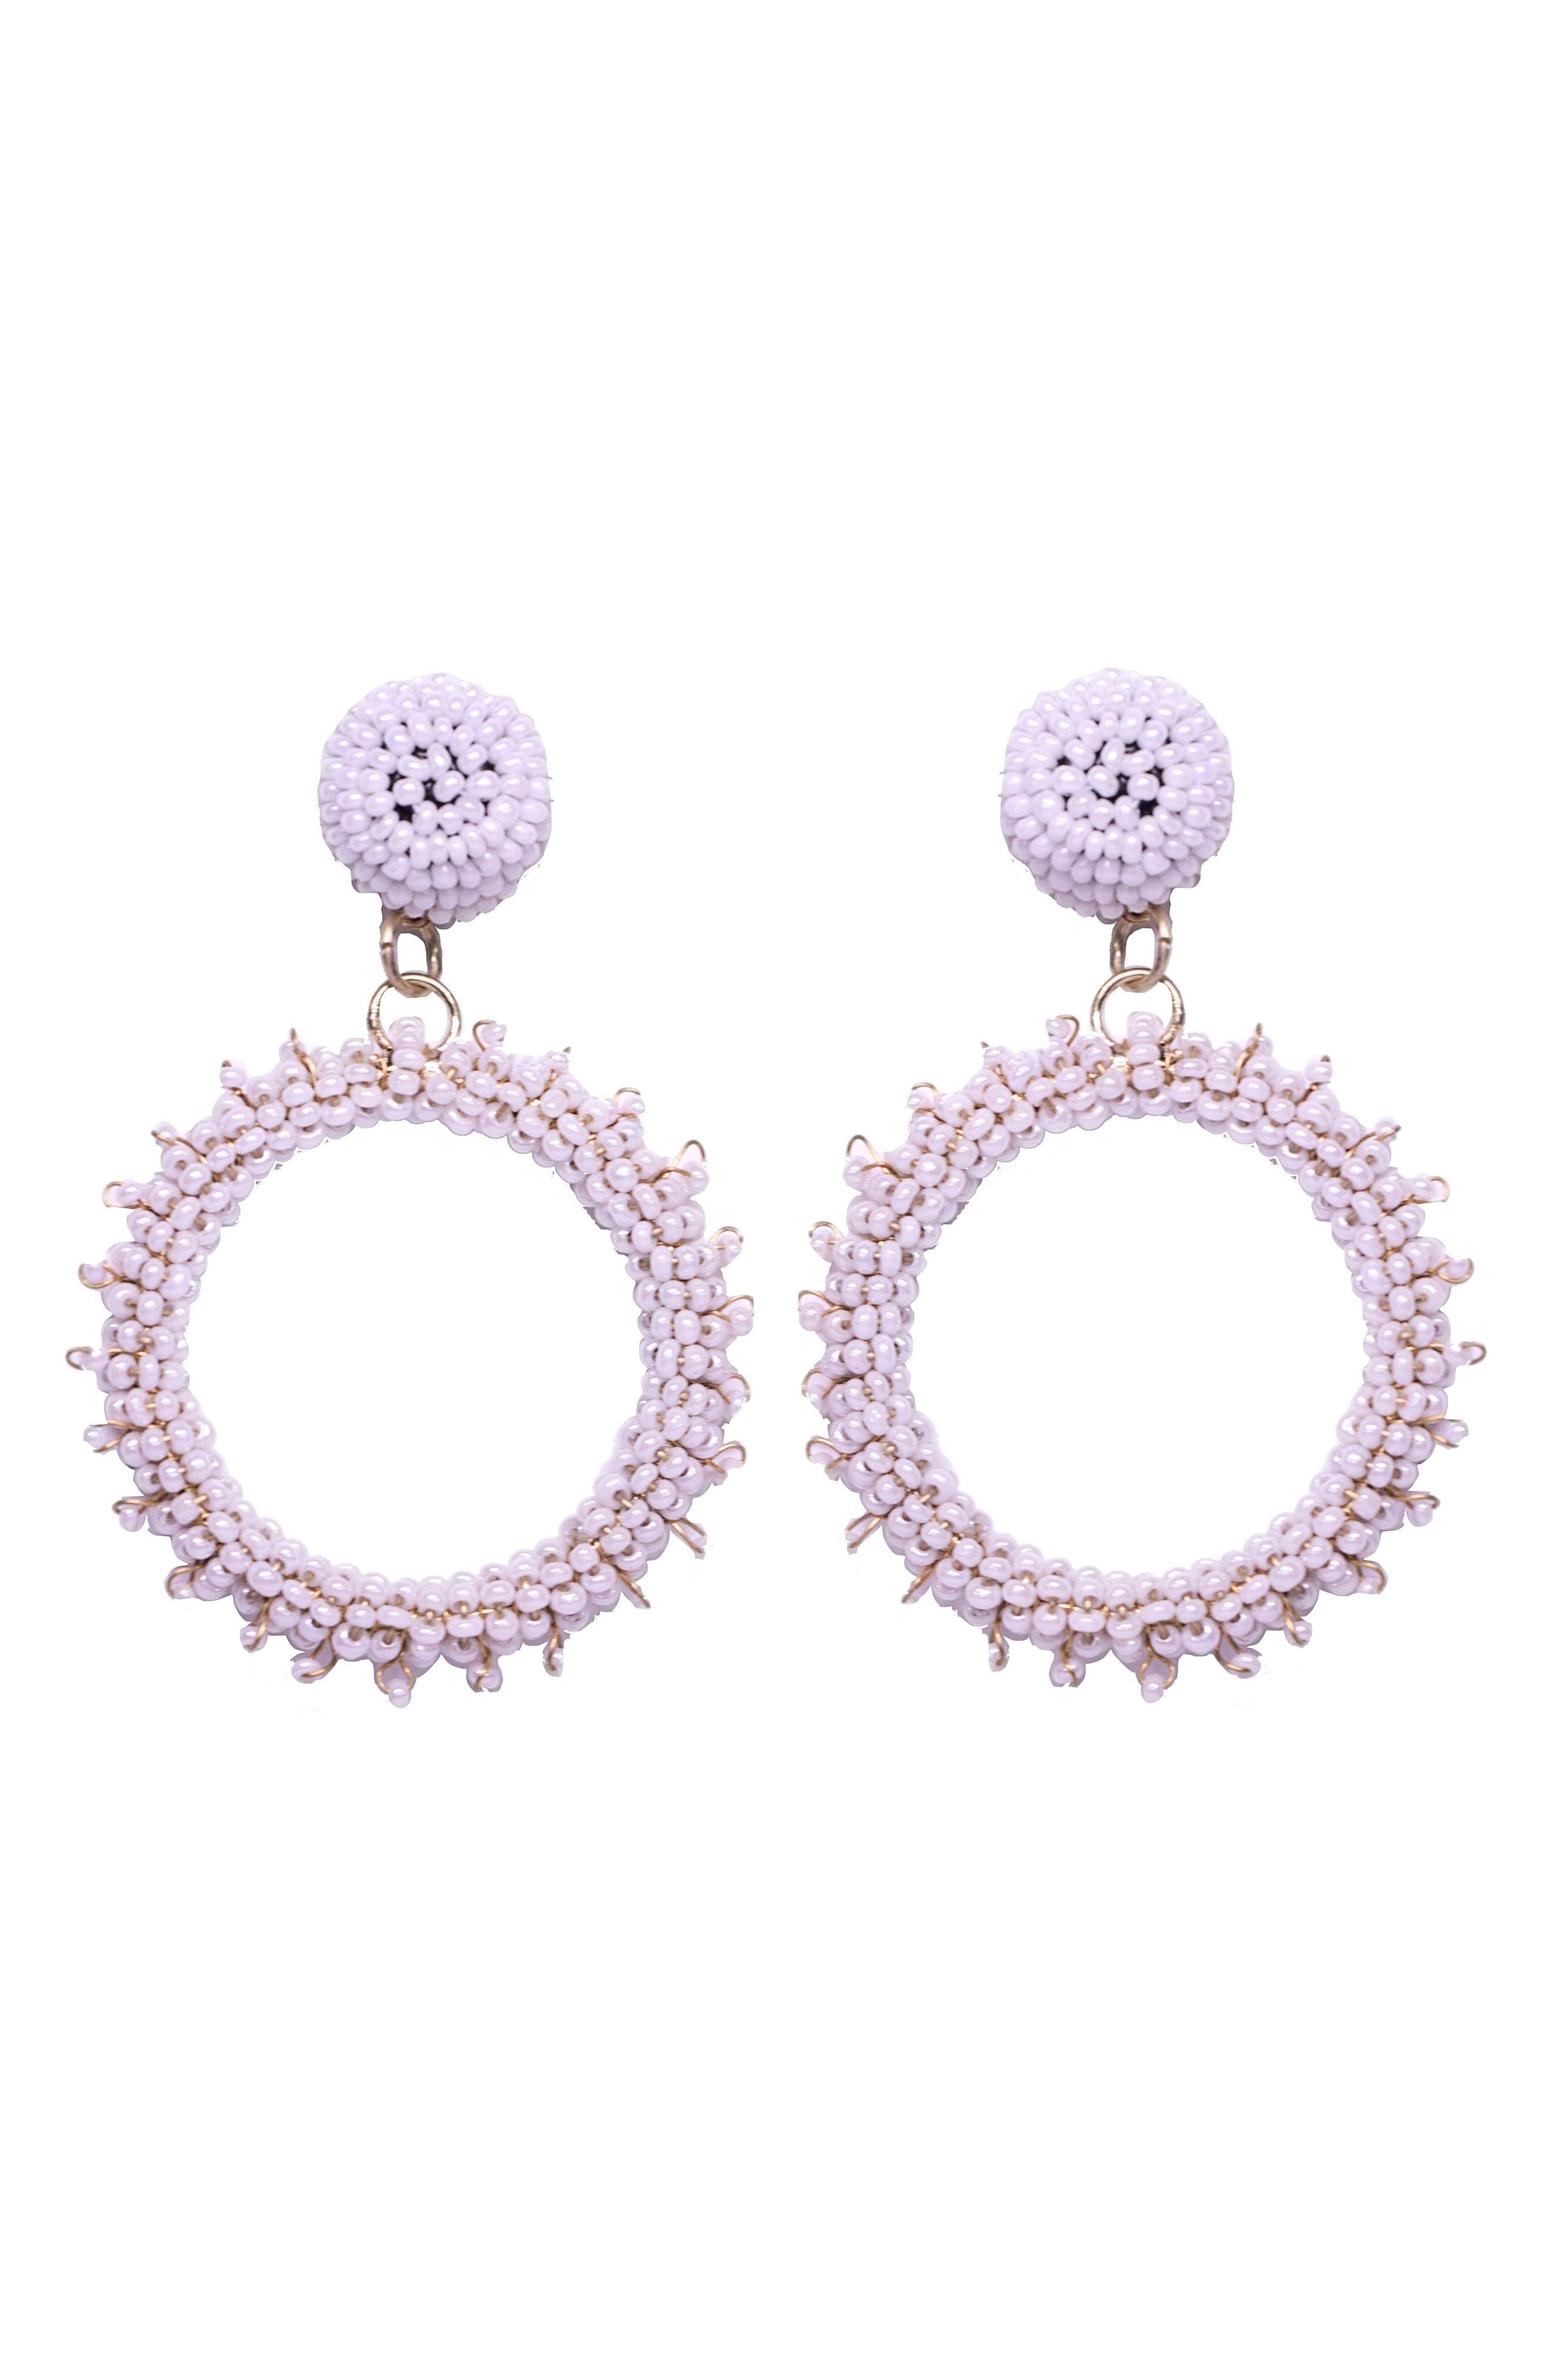 Marie Drop Earrings,                         Main,                         color, 100